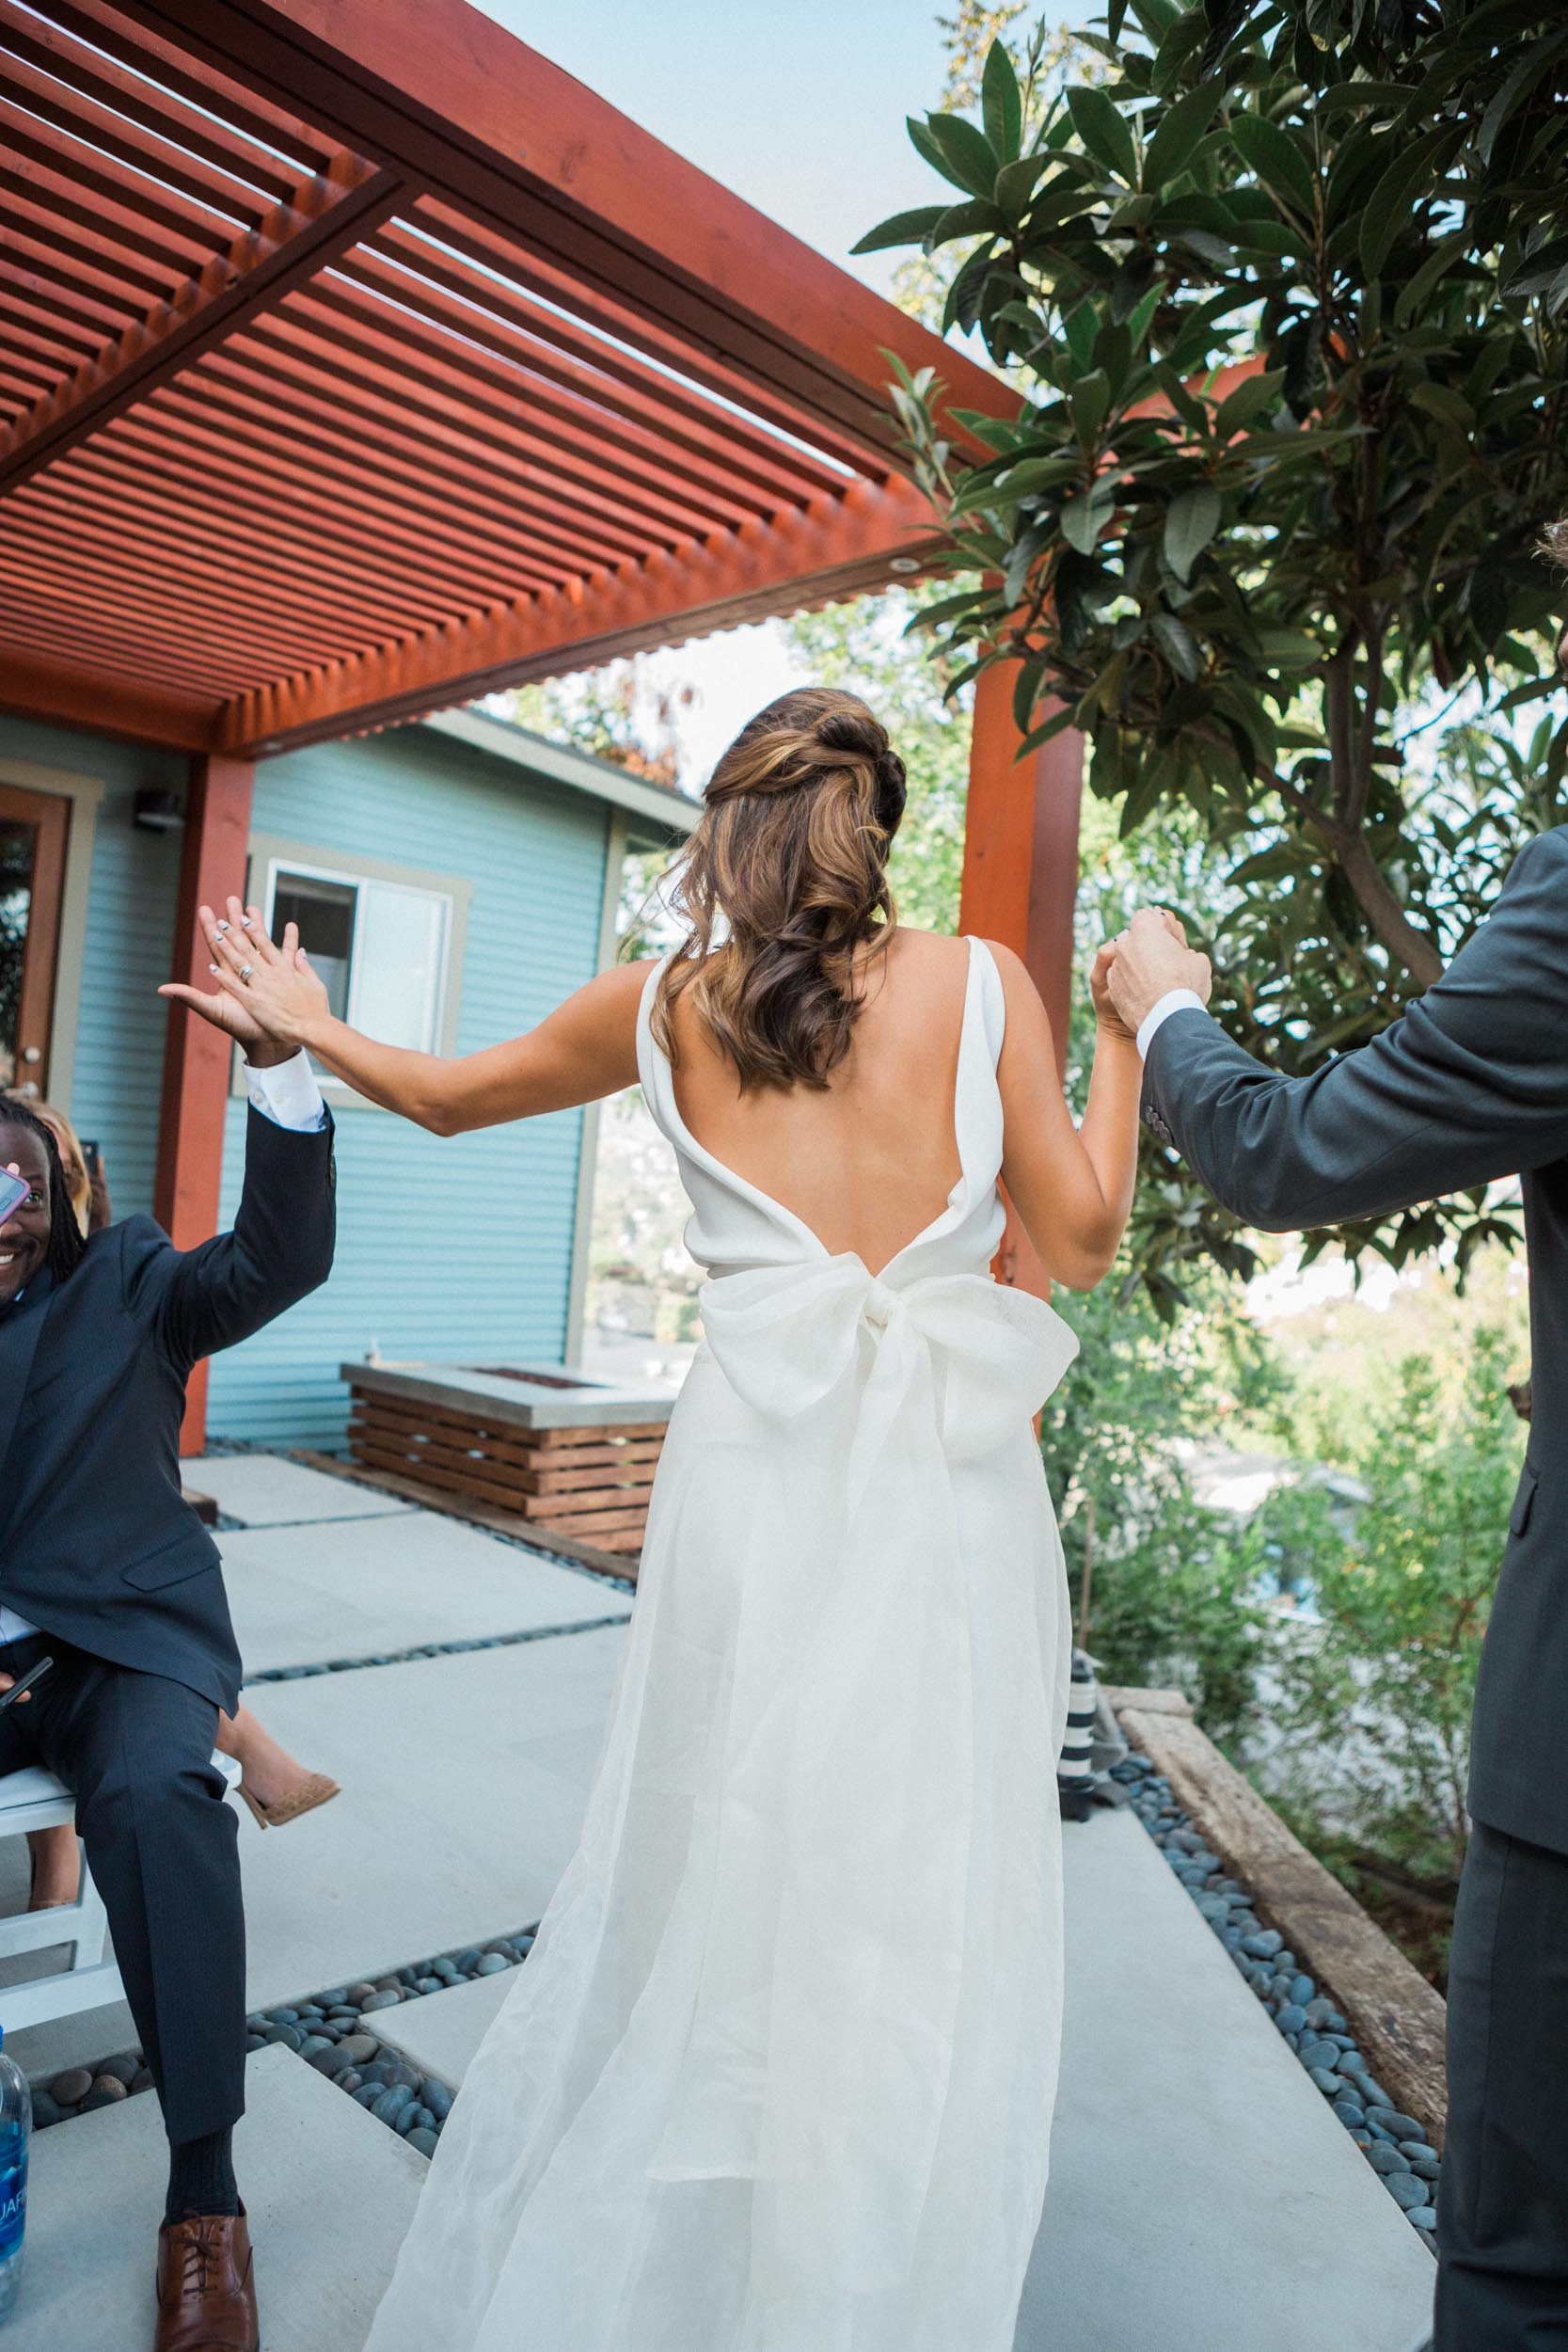 BKM-Photography-Highland-Park-Los-Angeles-Backyard-Wedding-0033.jpg